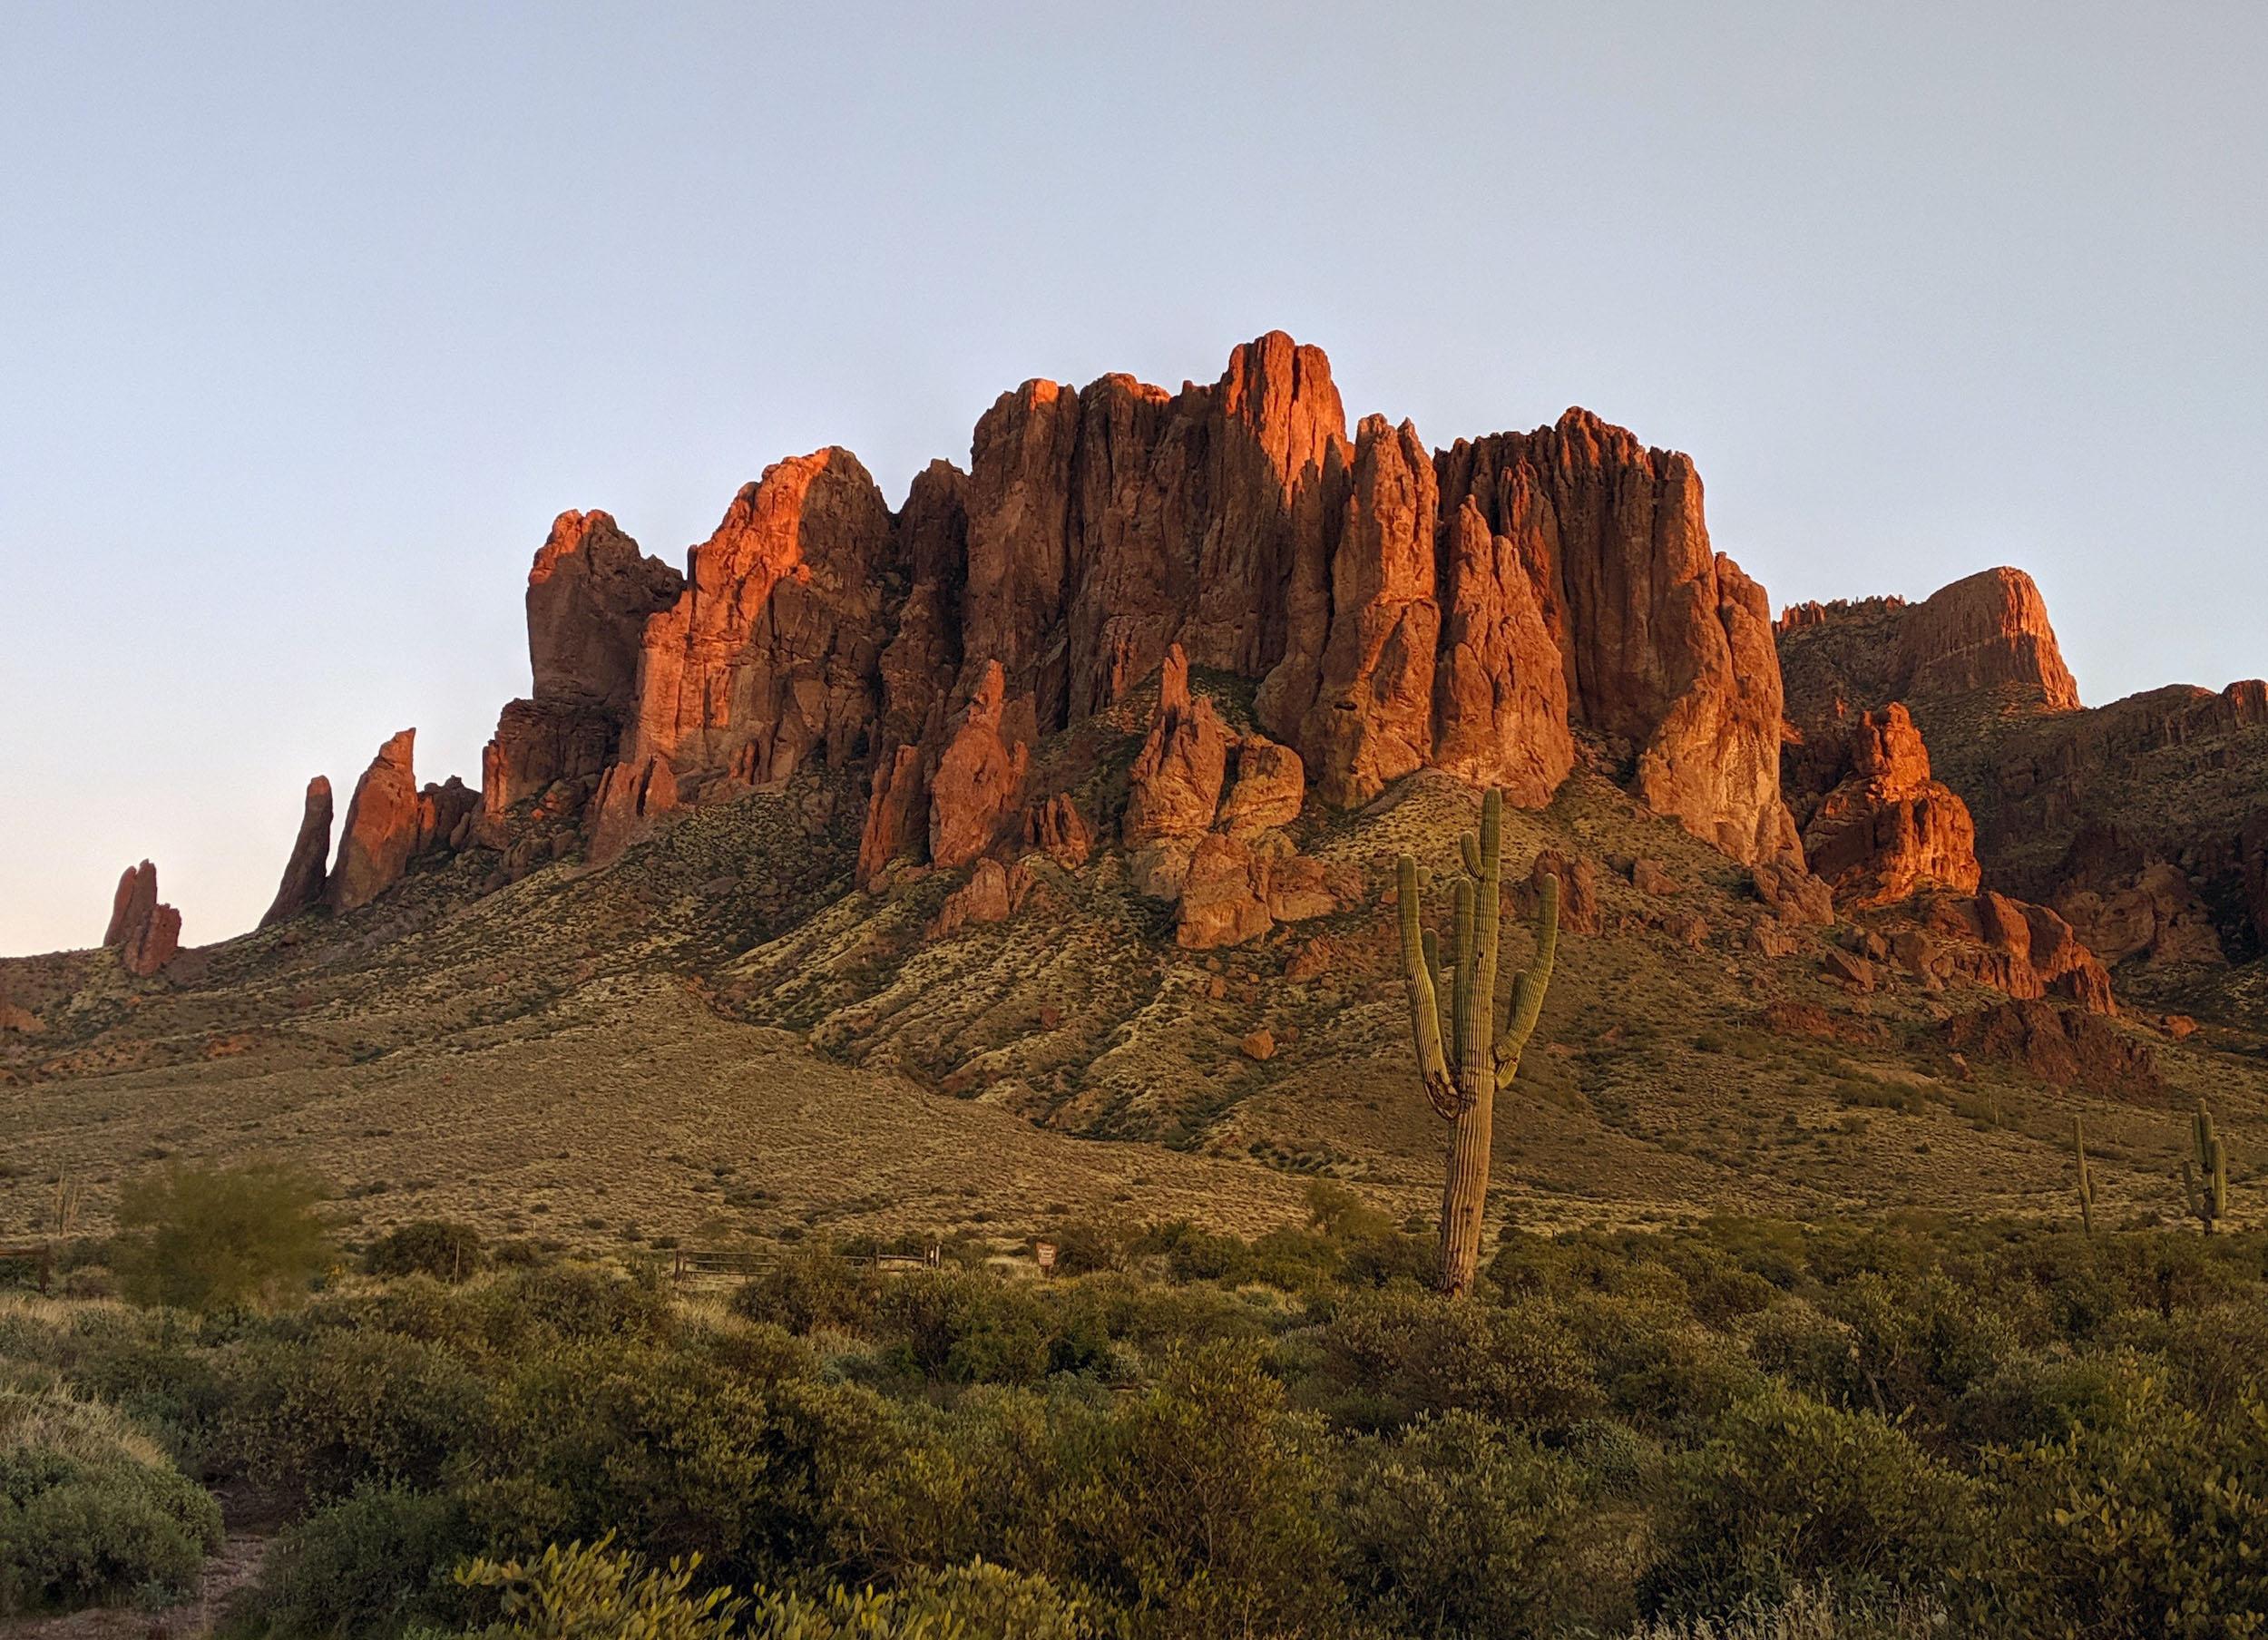 View outside of Phoenix